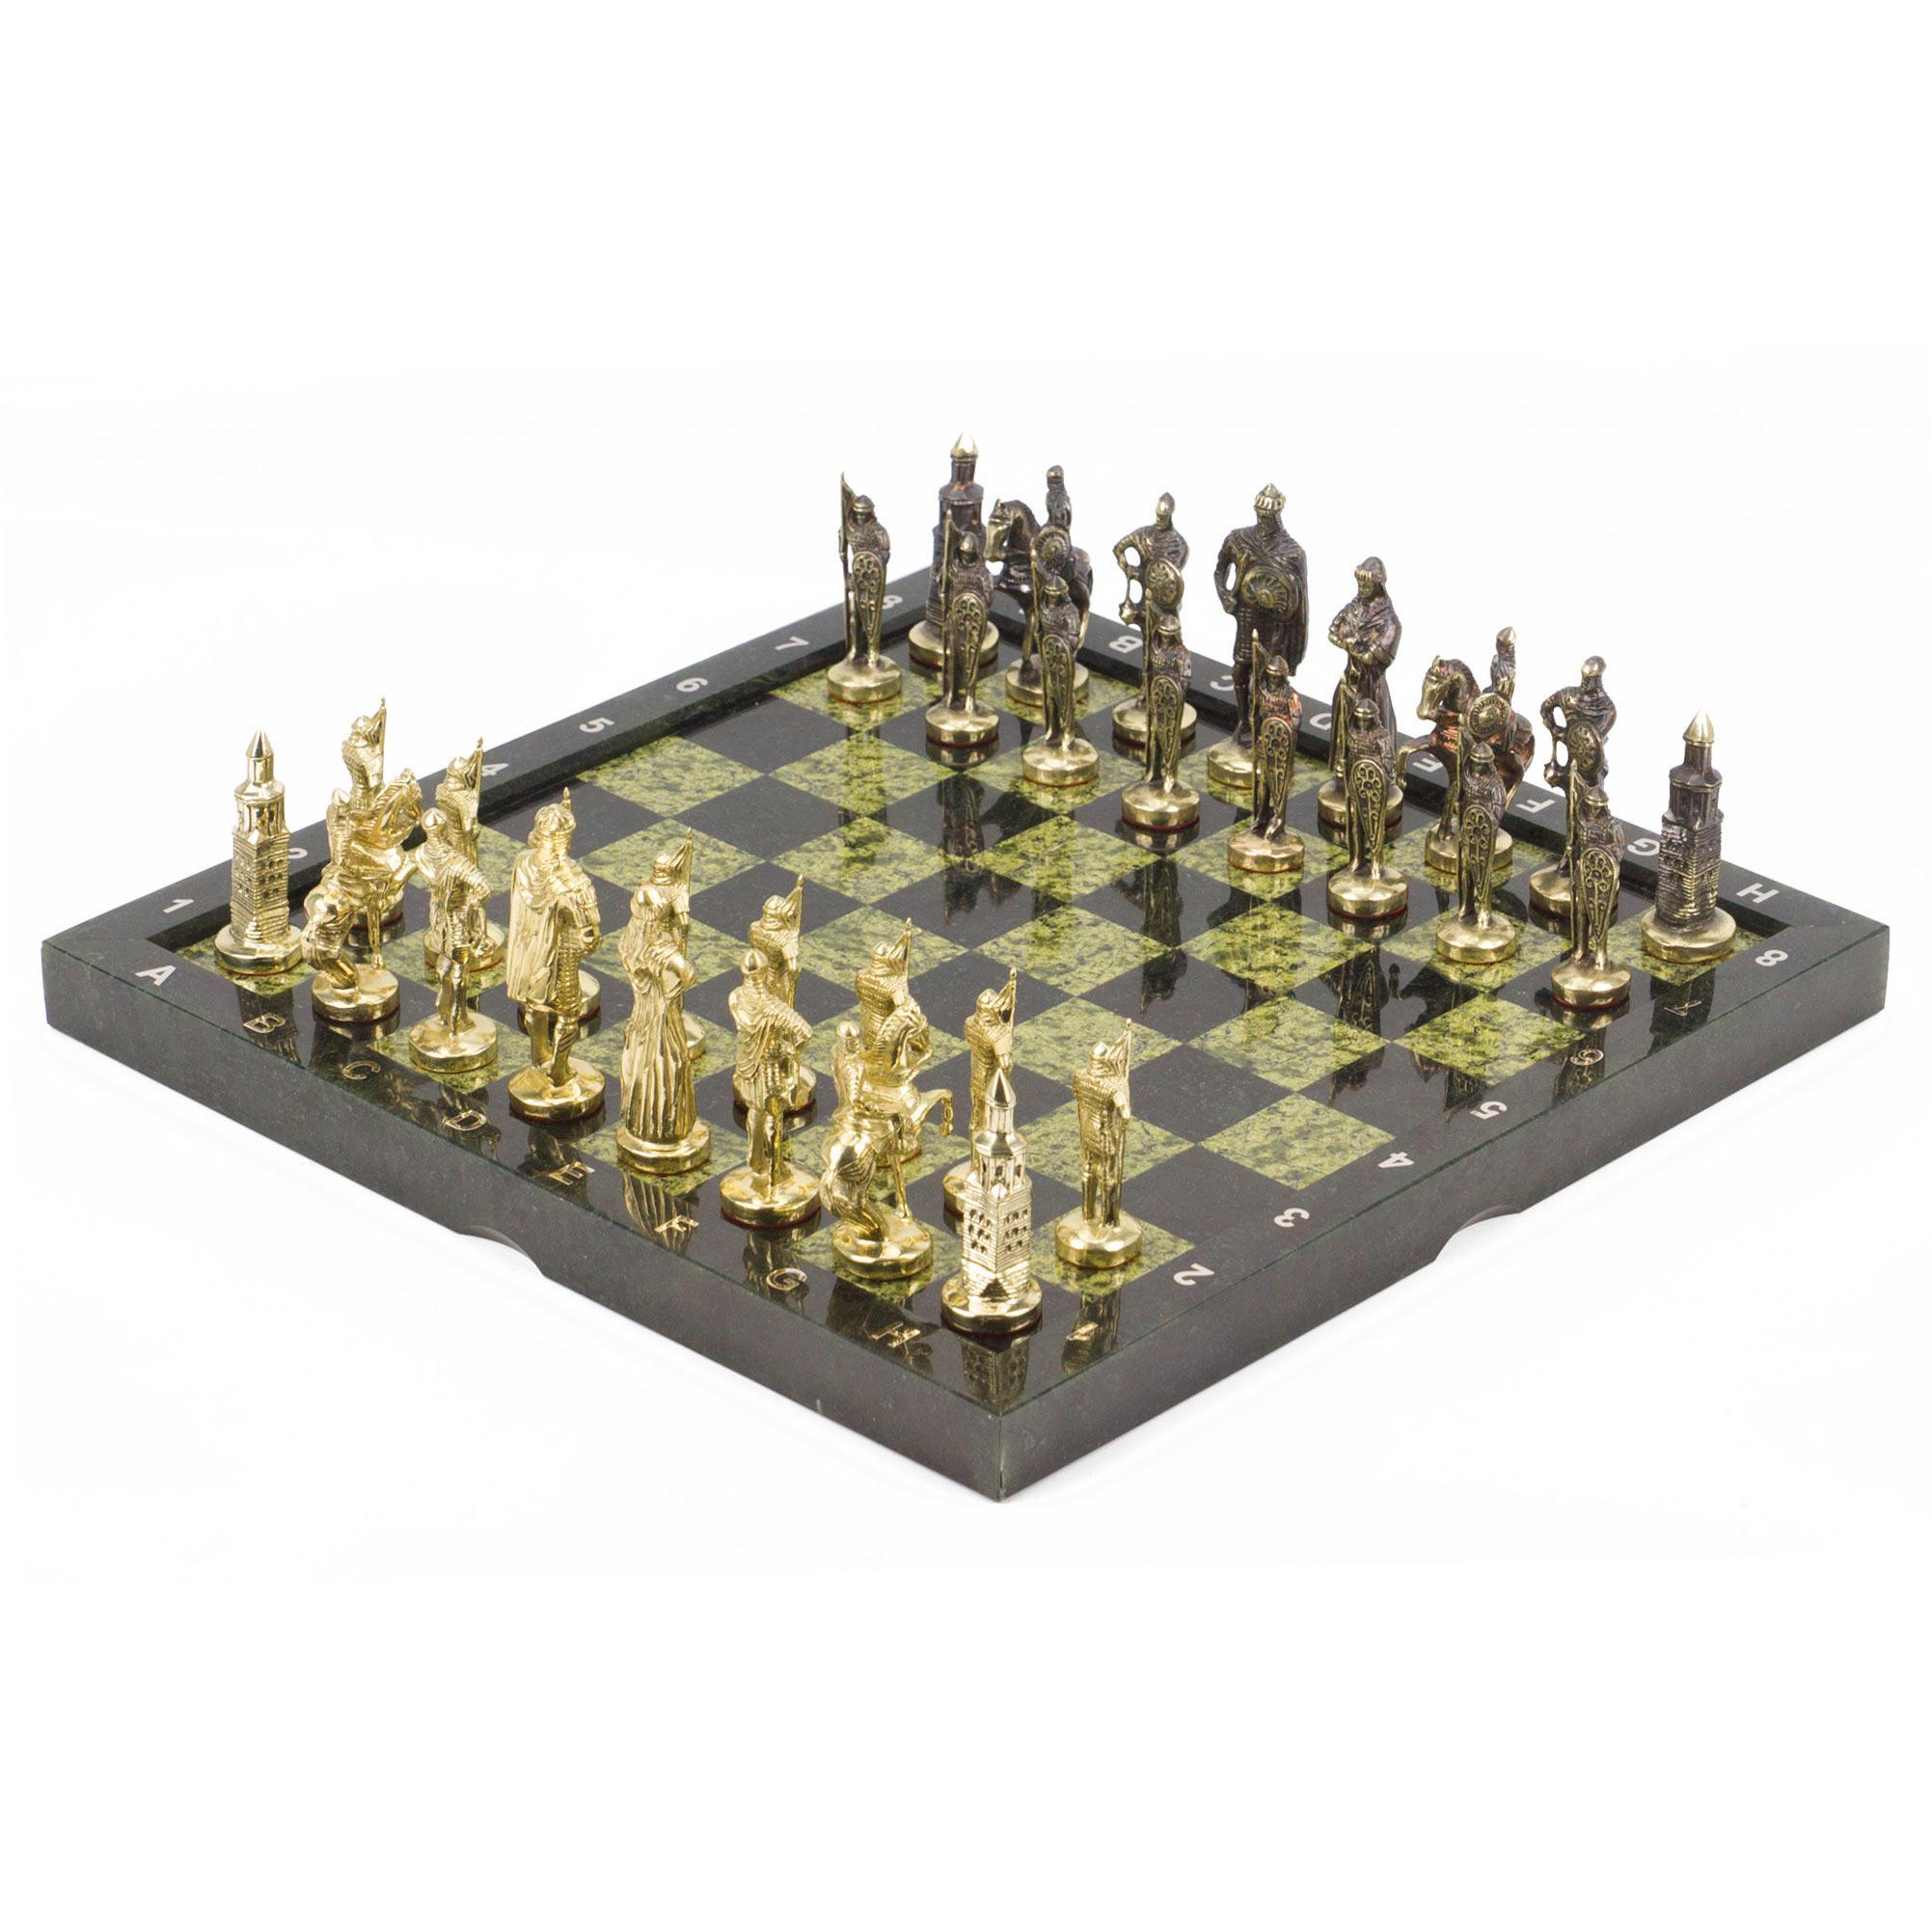 Шахматы Русские, фигуры - бронза, доска змеевик, 36х36см